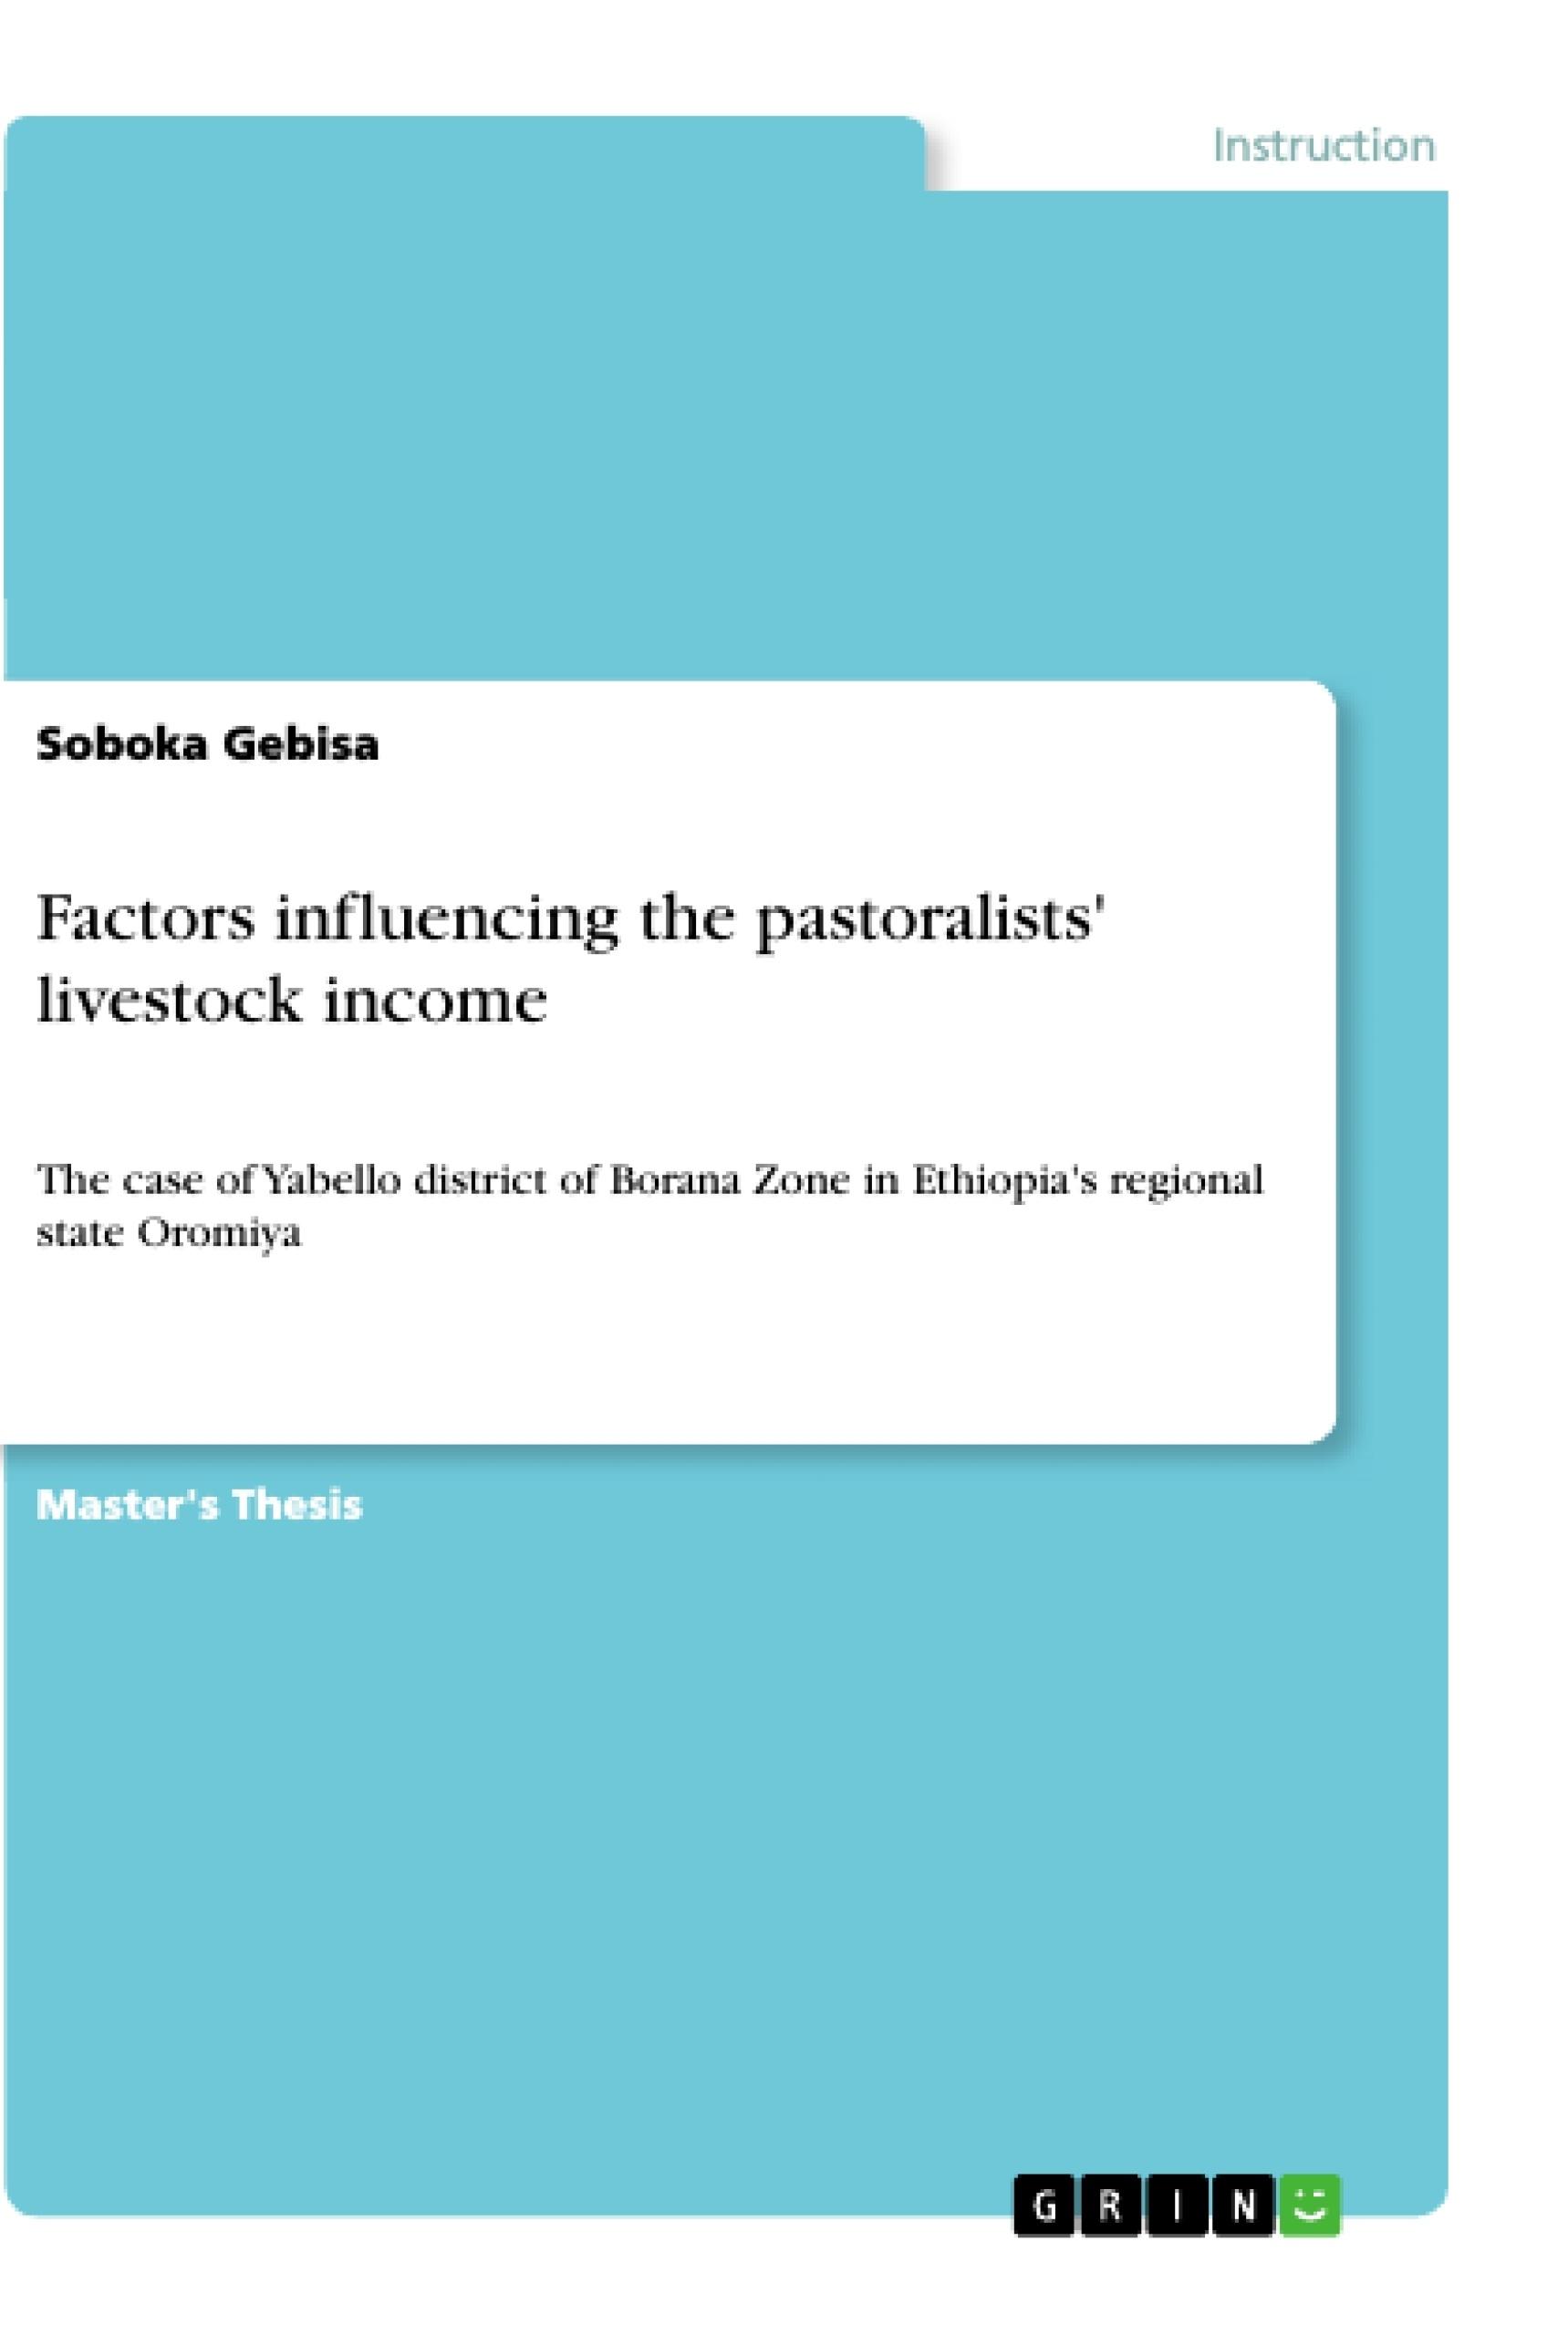 Title: Factors influencing the pastoralists' livestock income